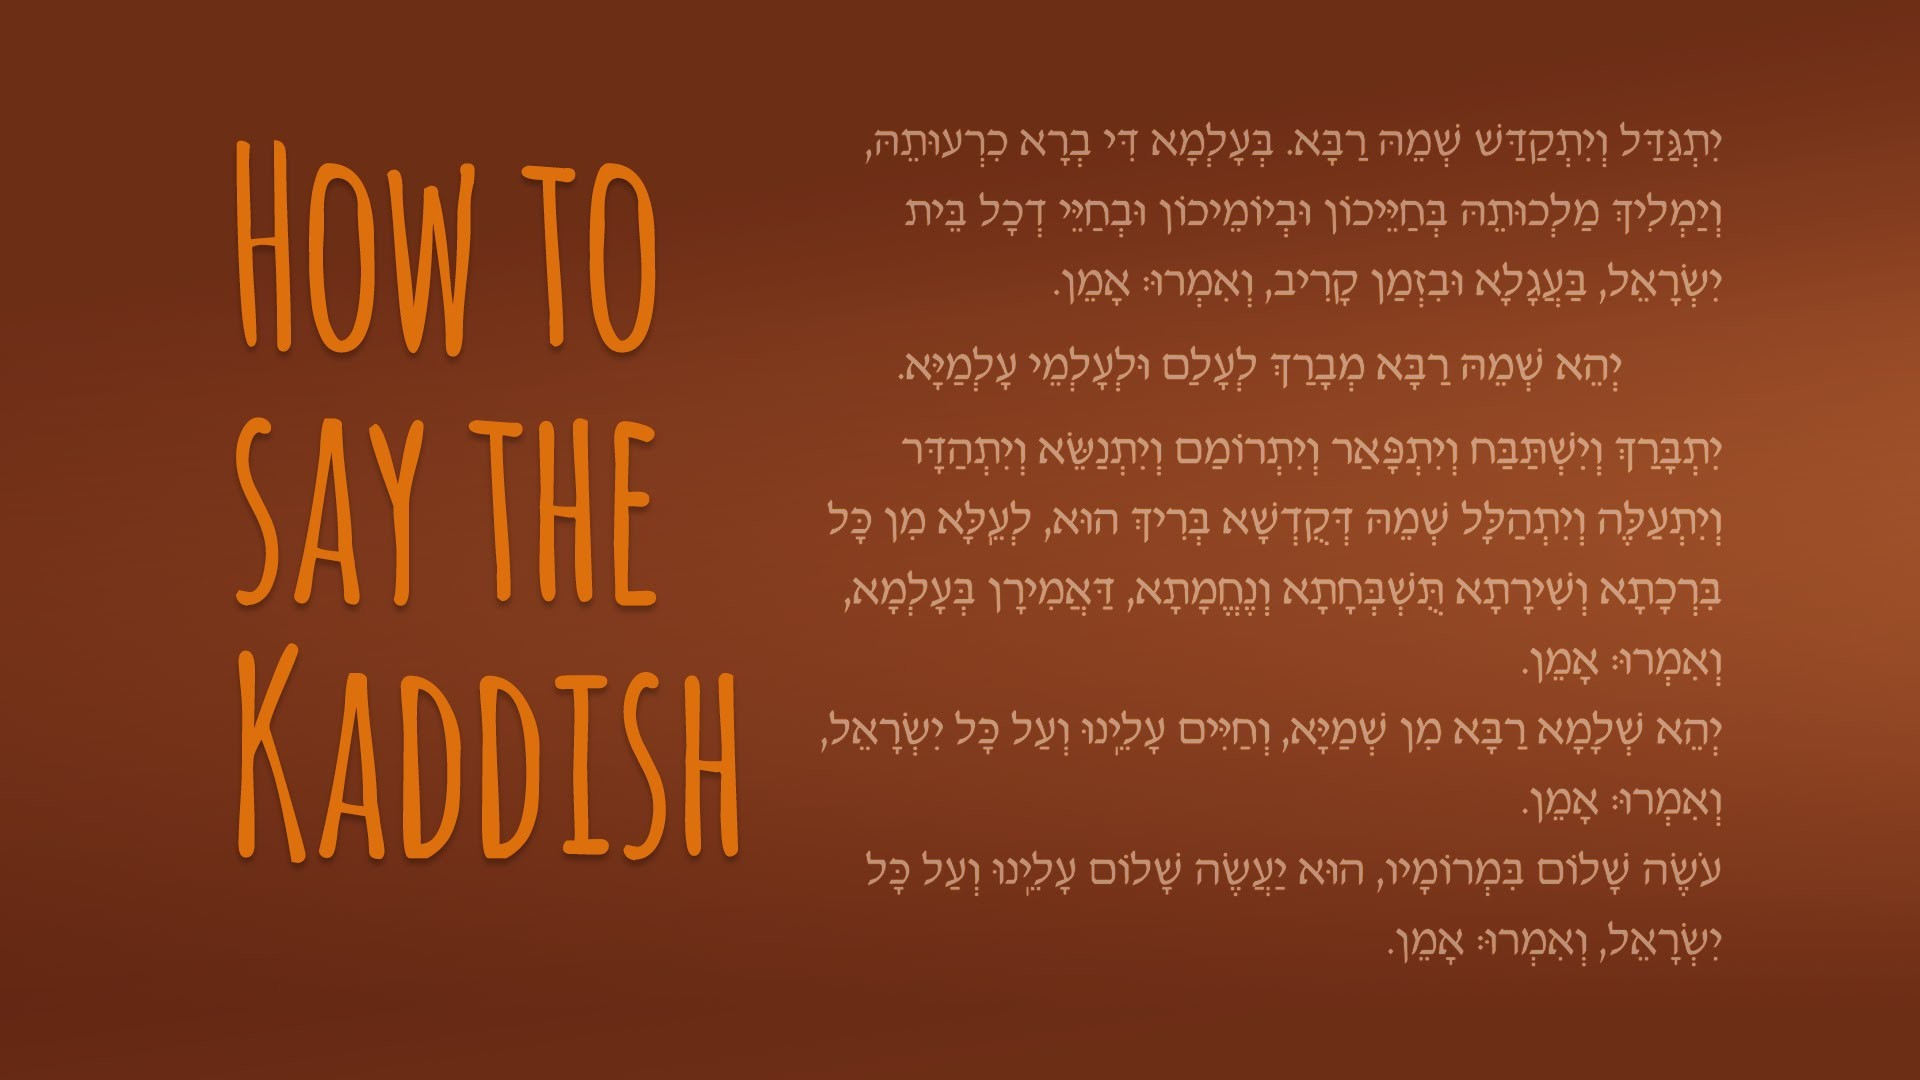 Kaddish, a Memorial Prayer in Praise of God